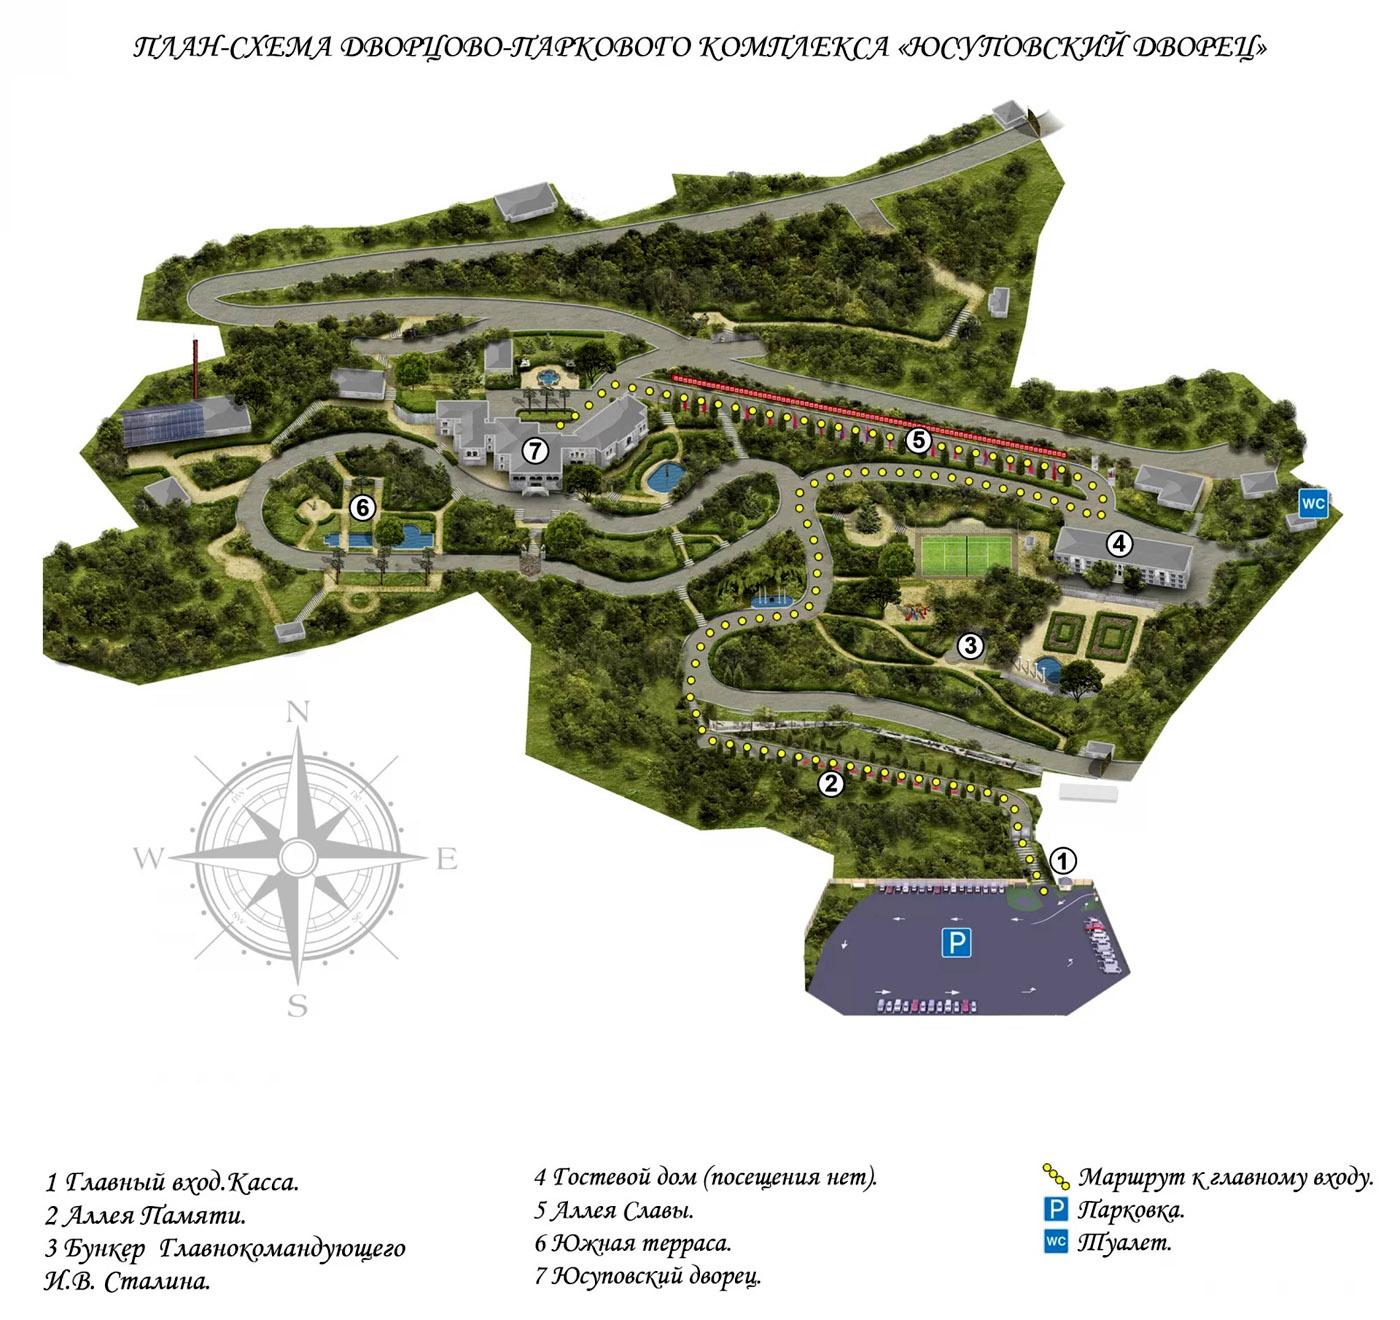 План-схема Юсуповского дворца